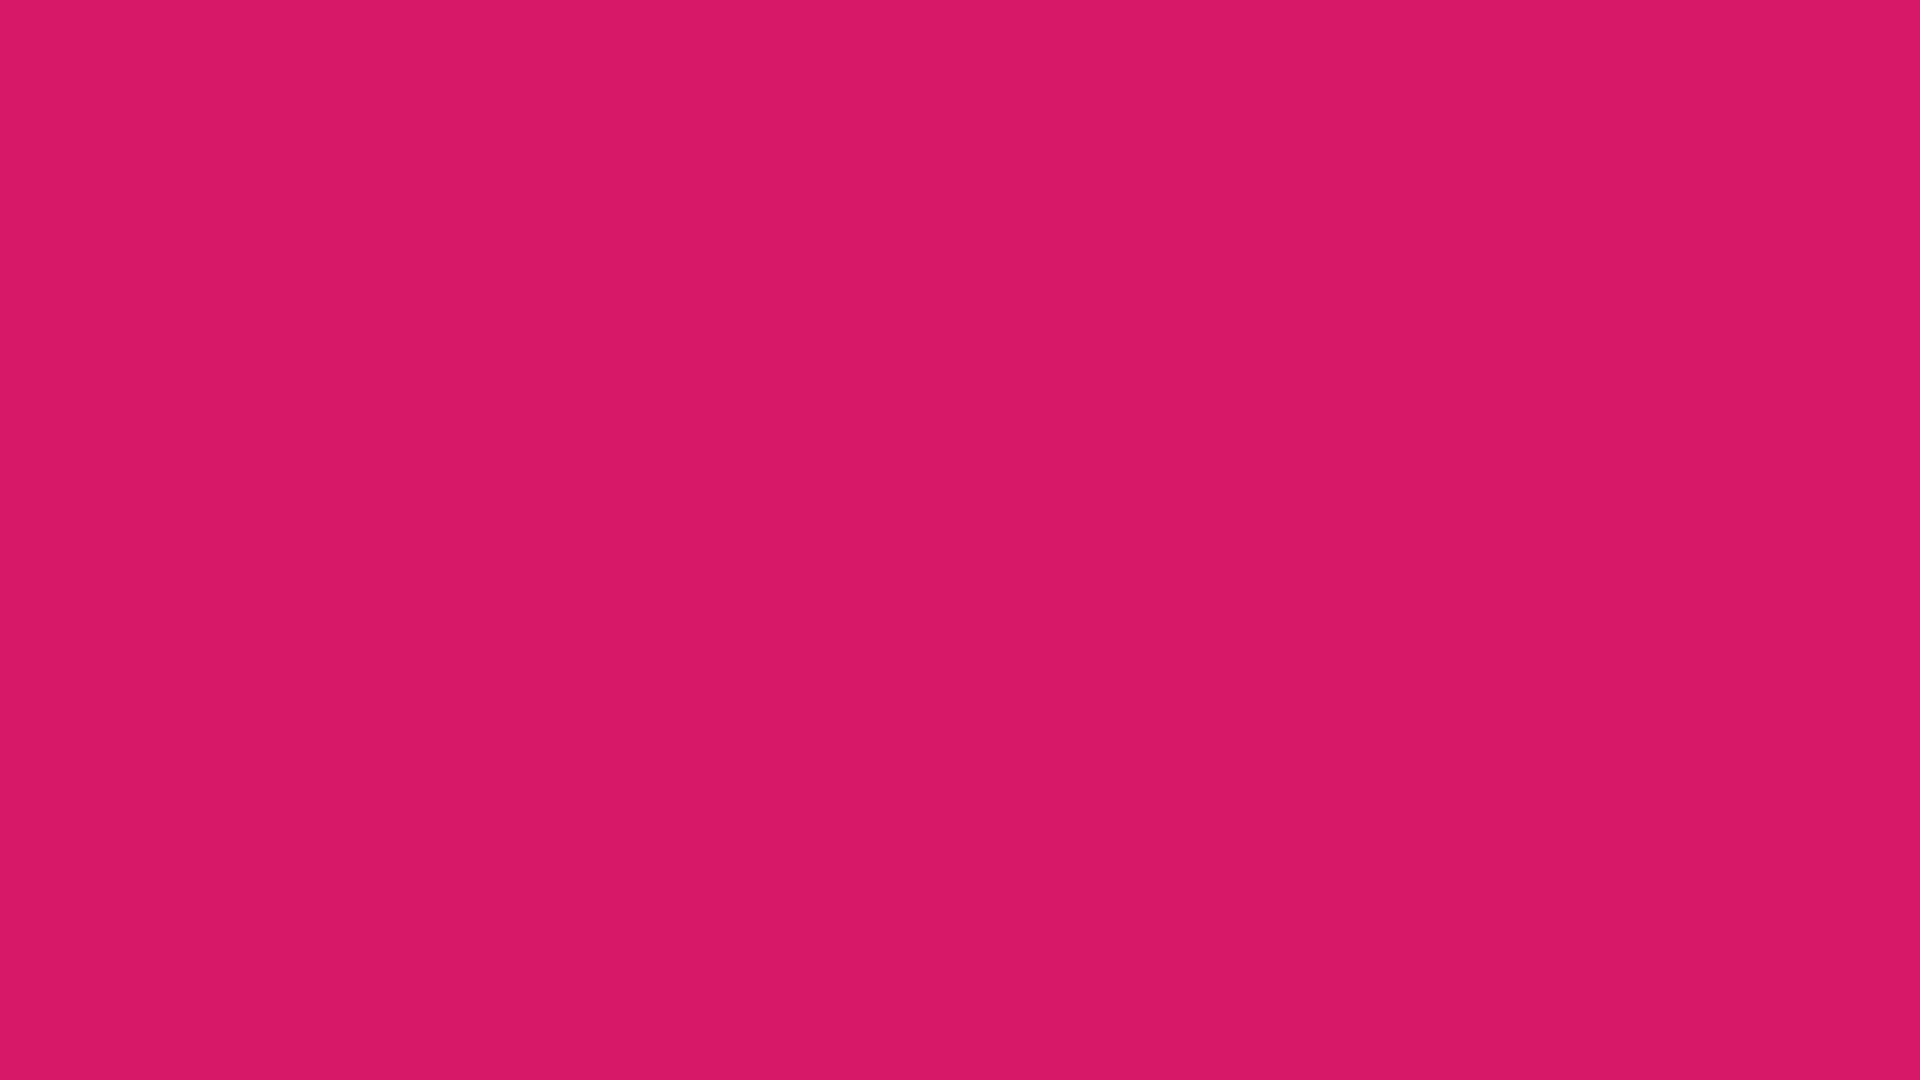 1920x1080 Dogwood Rose Solid Color Background